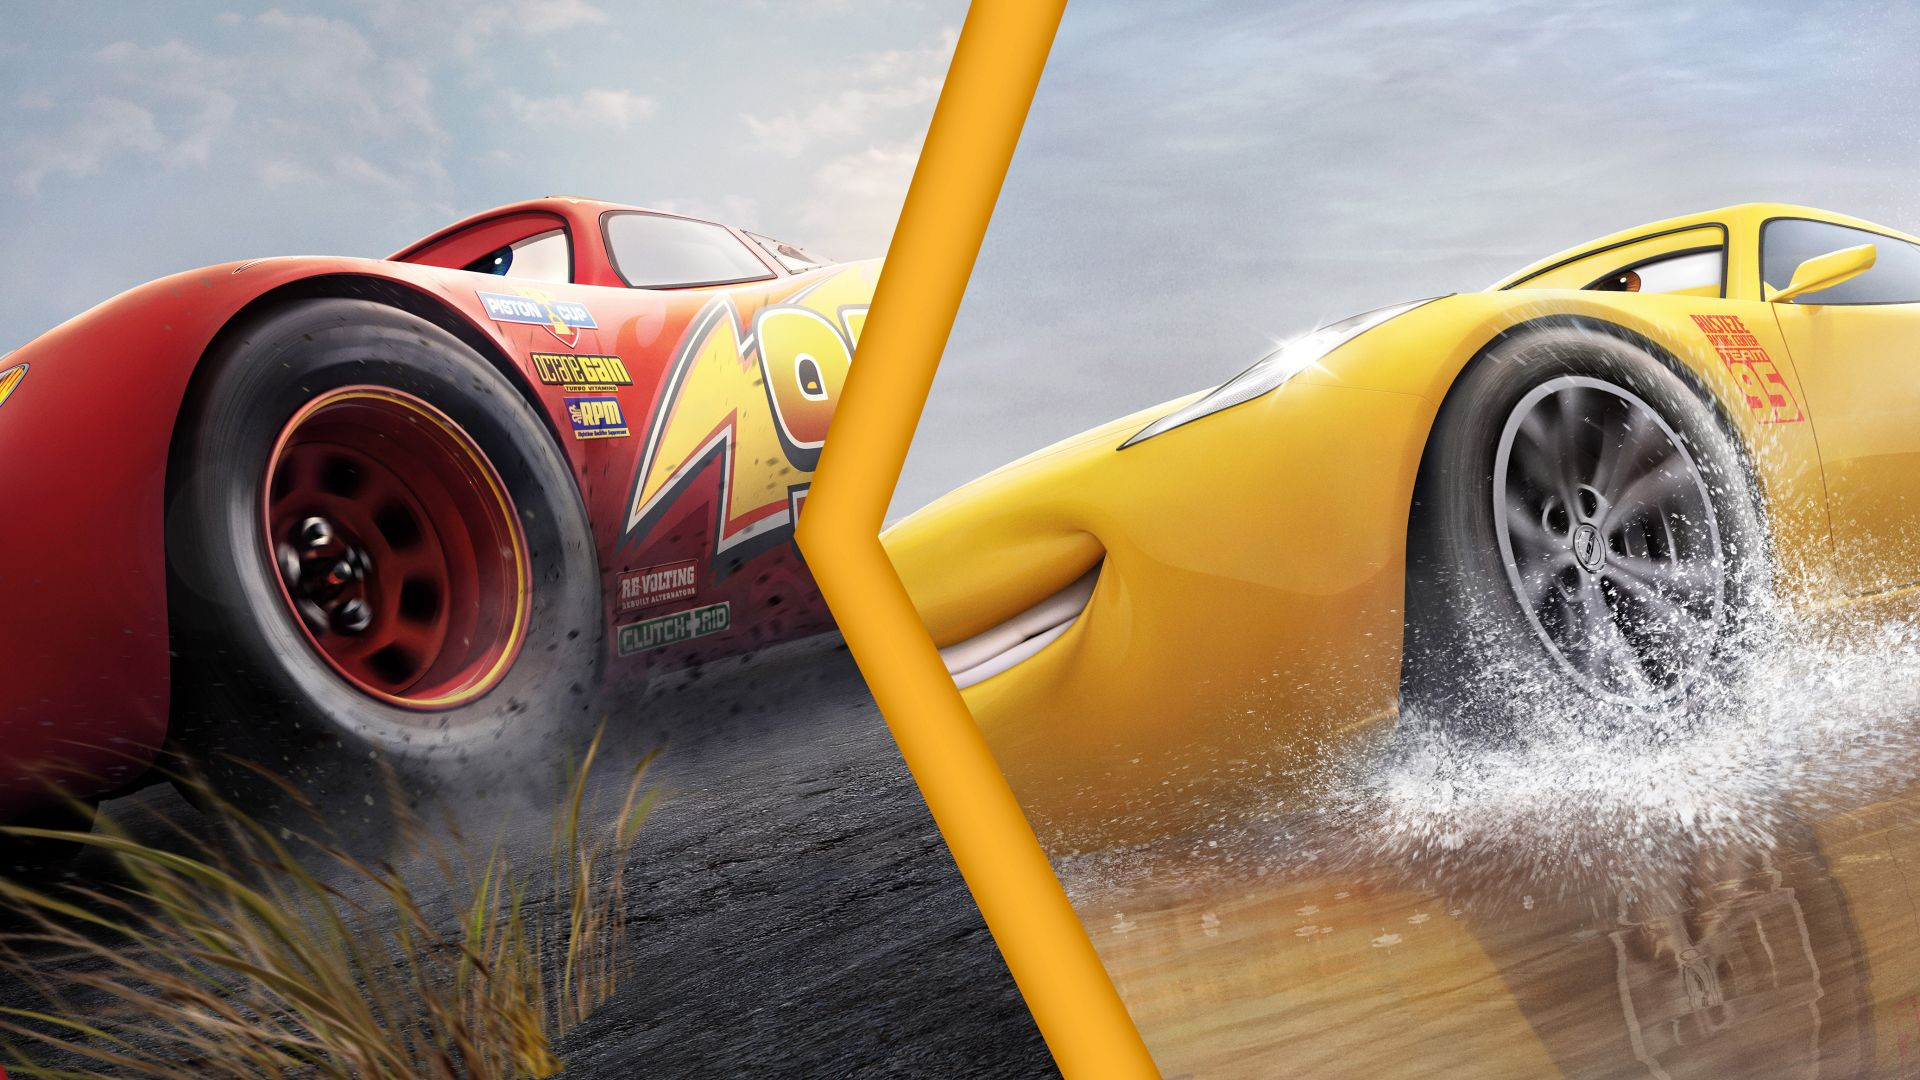 Desktop Wallpaper Race Lightning Mc Queen Vs Cruz Ramirez Cars 3